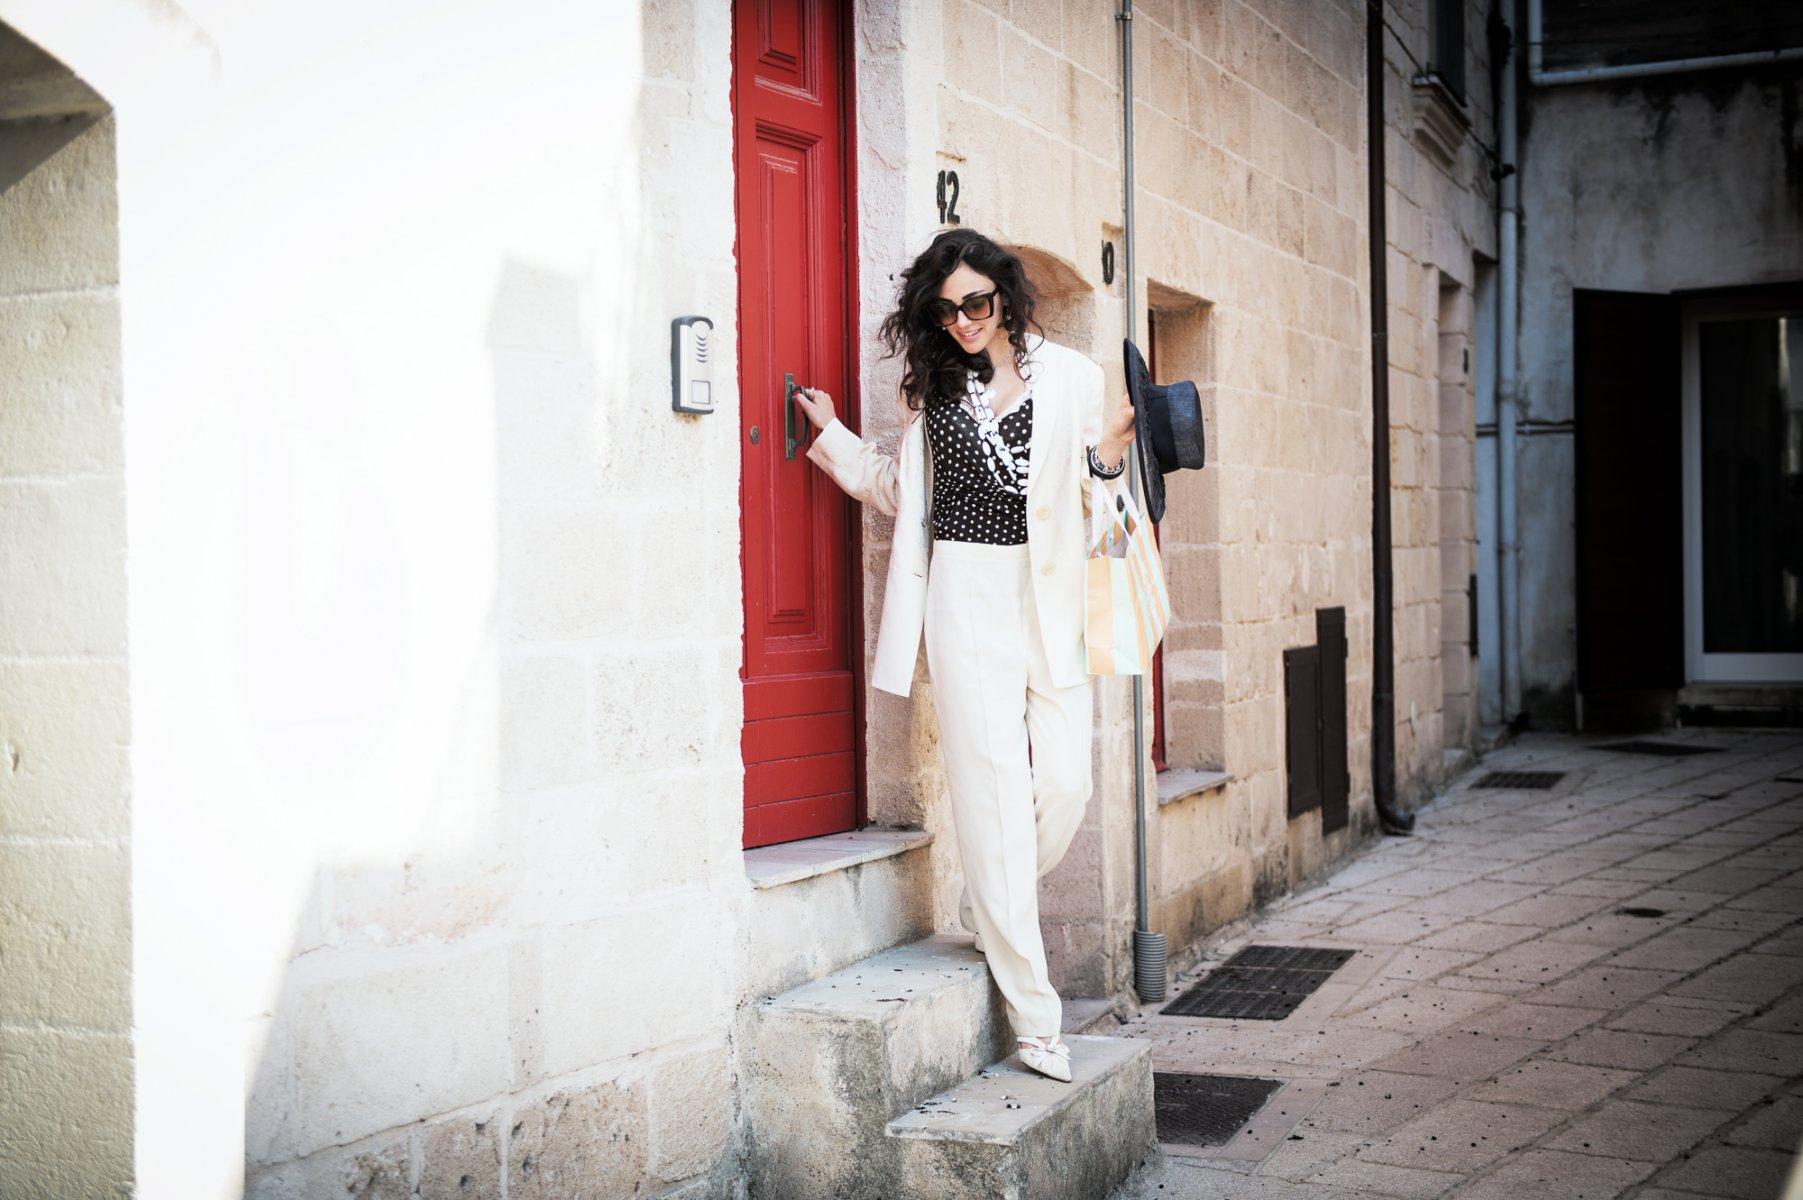 144-Pretty_Woman_MMD9419 Fashion/Adv